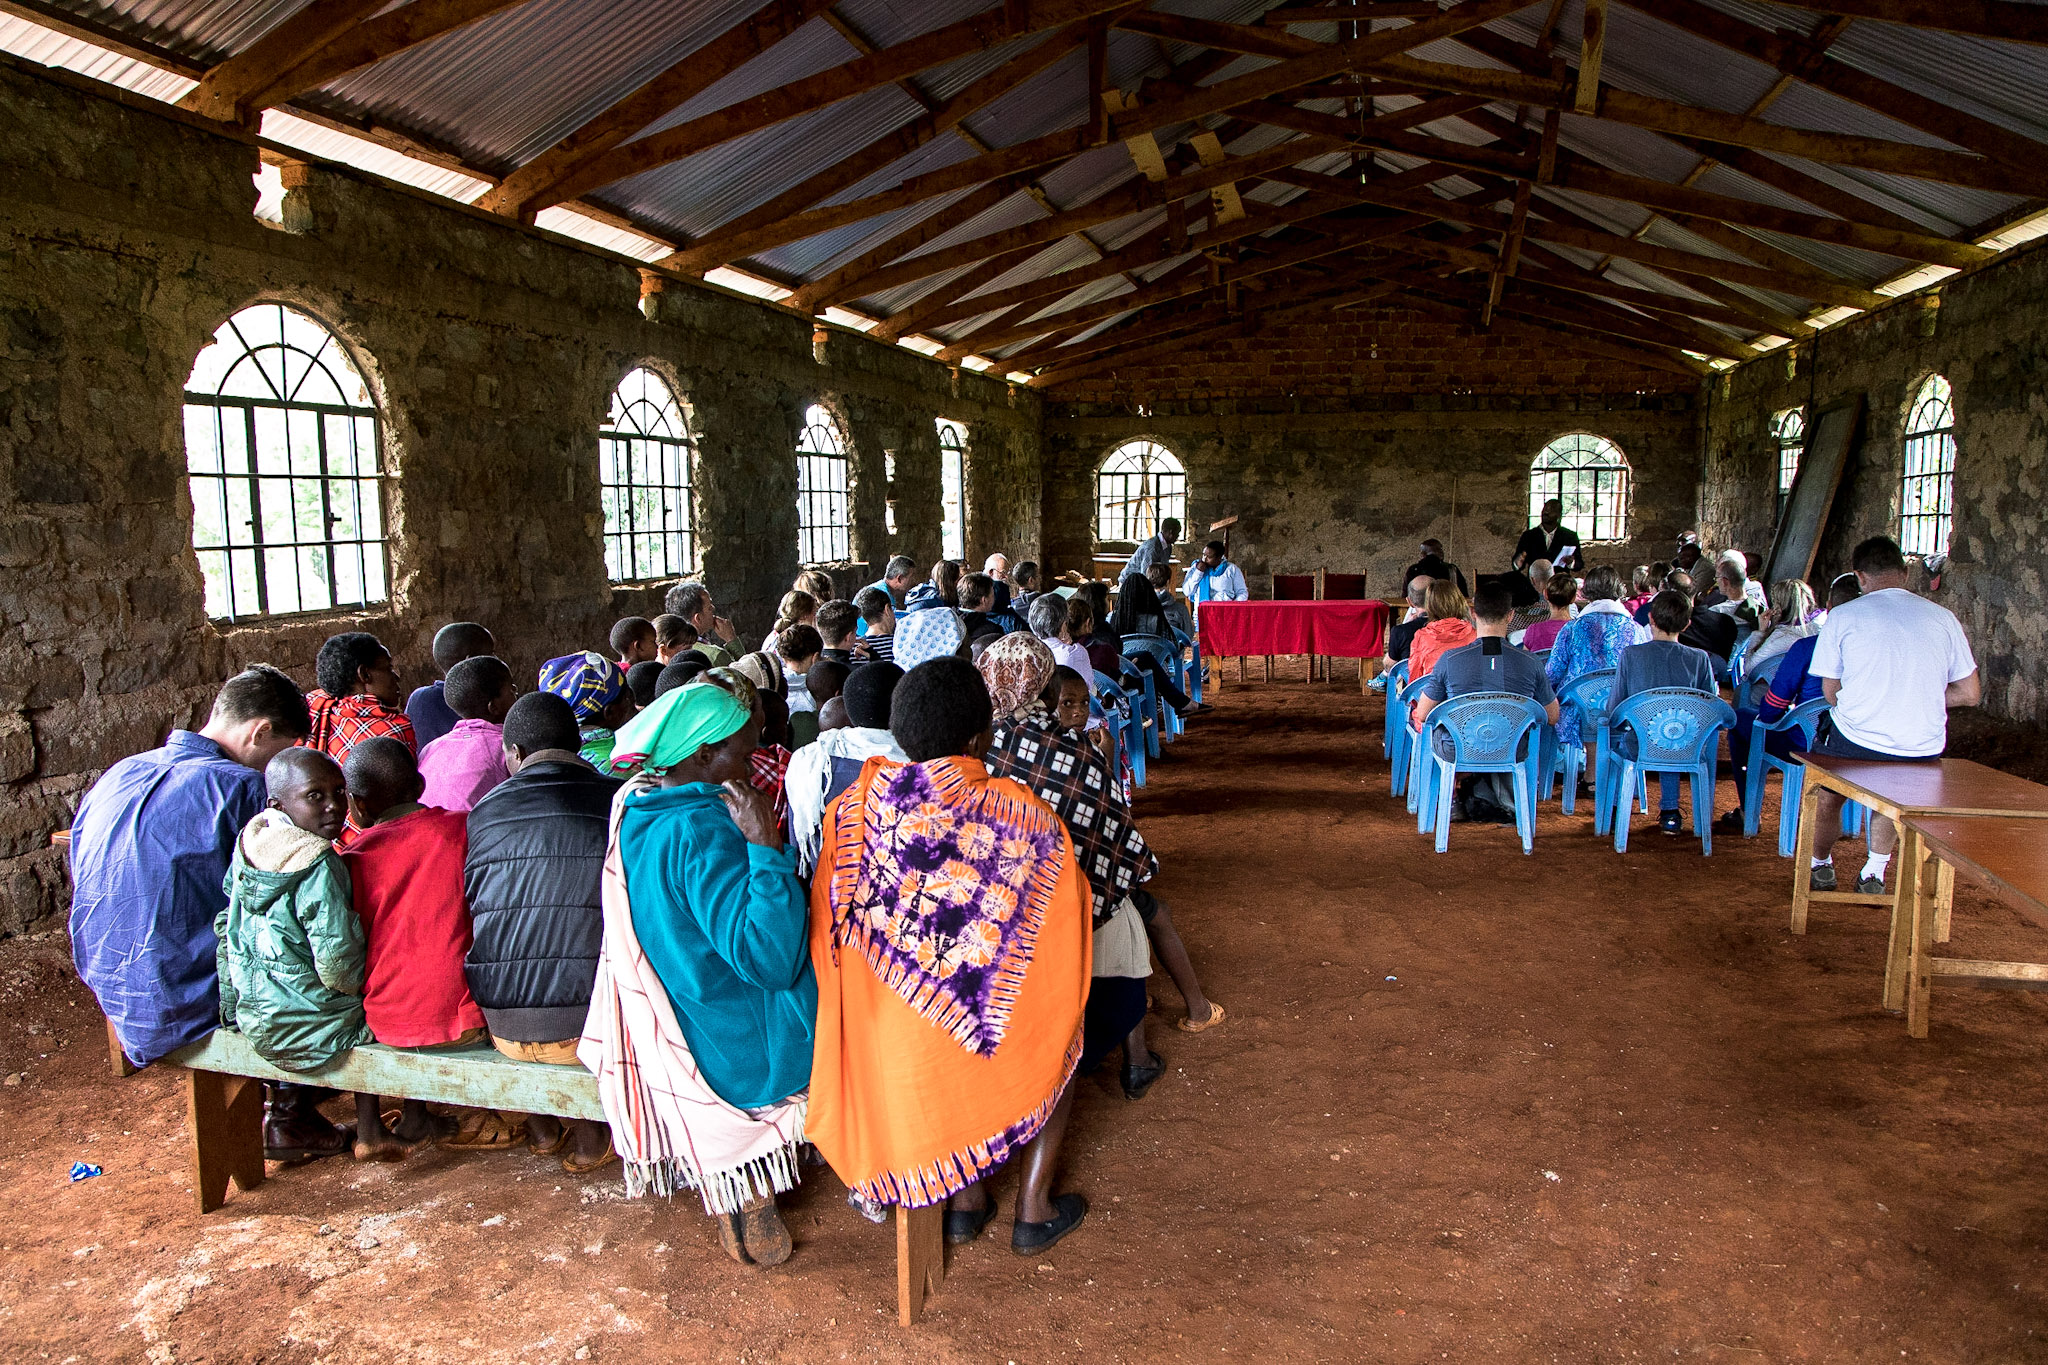 Adam Dickens 2017 - Five Talents-IMS, Kenya 2315.jpg